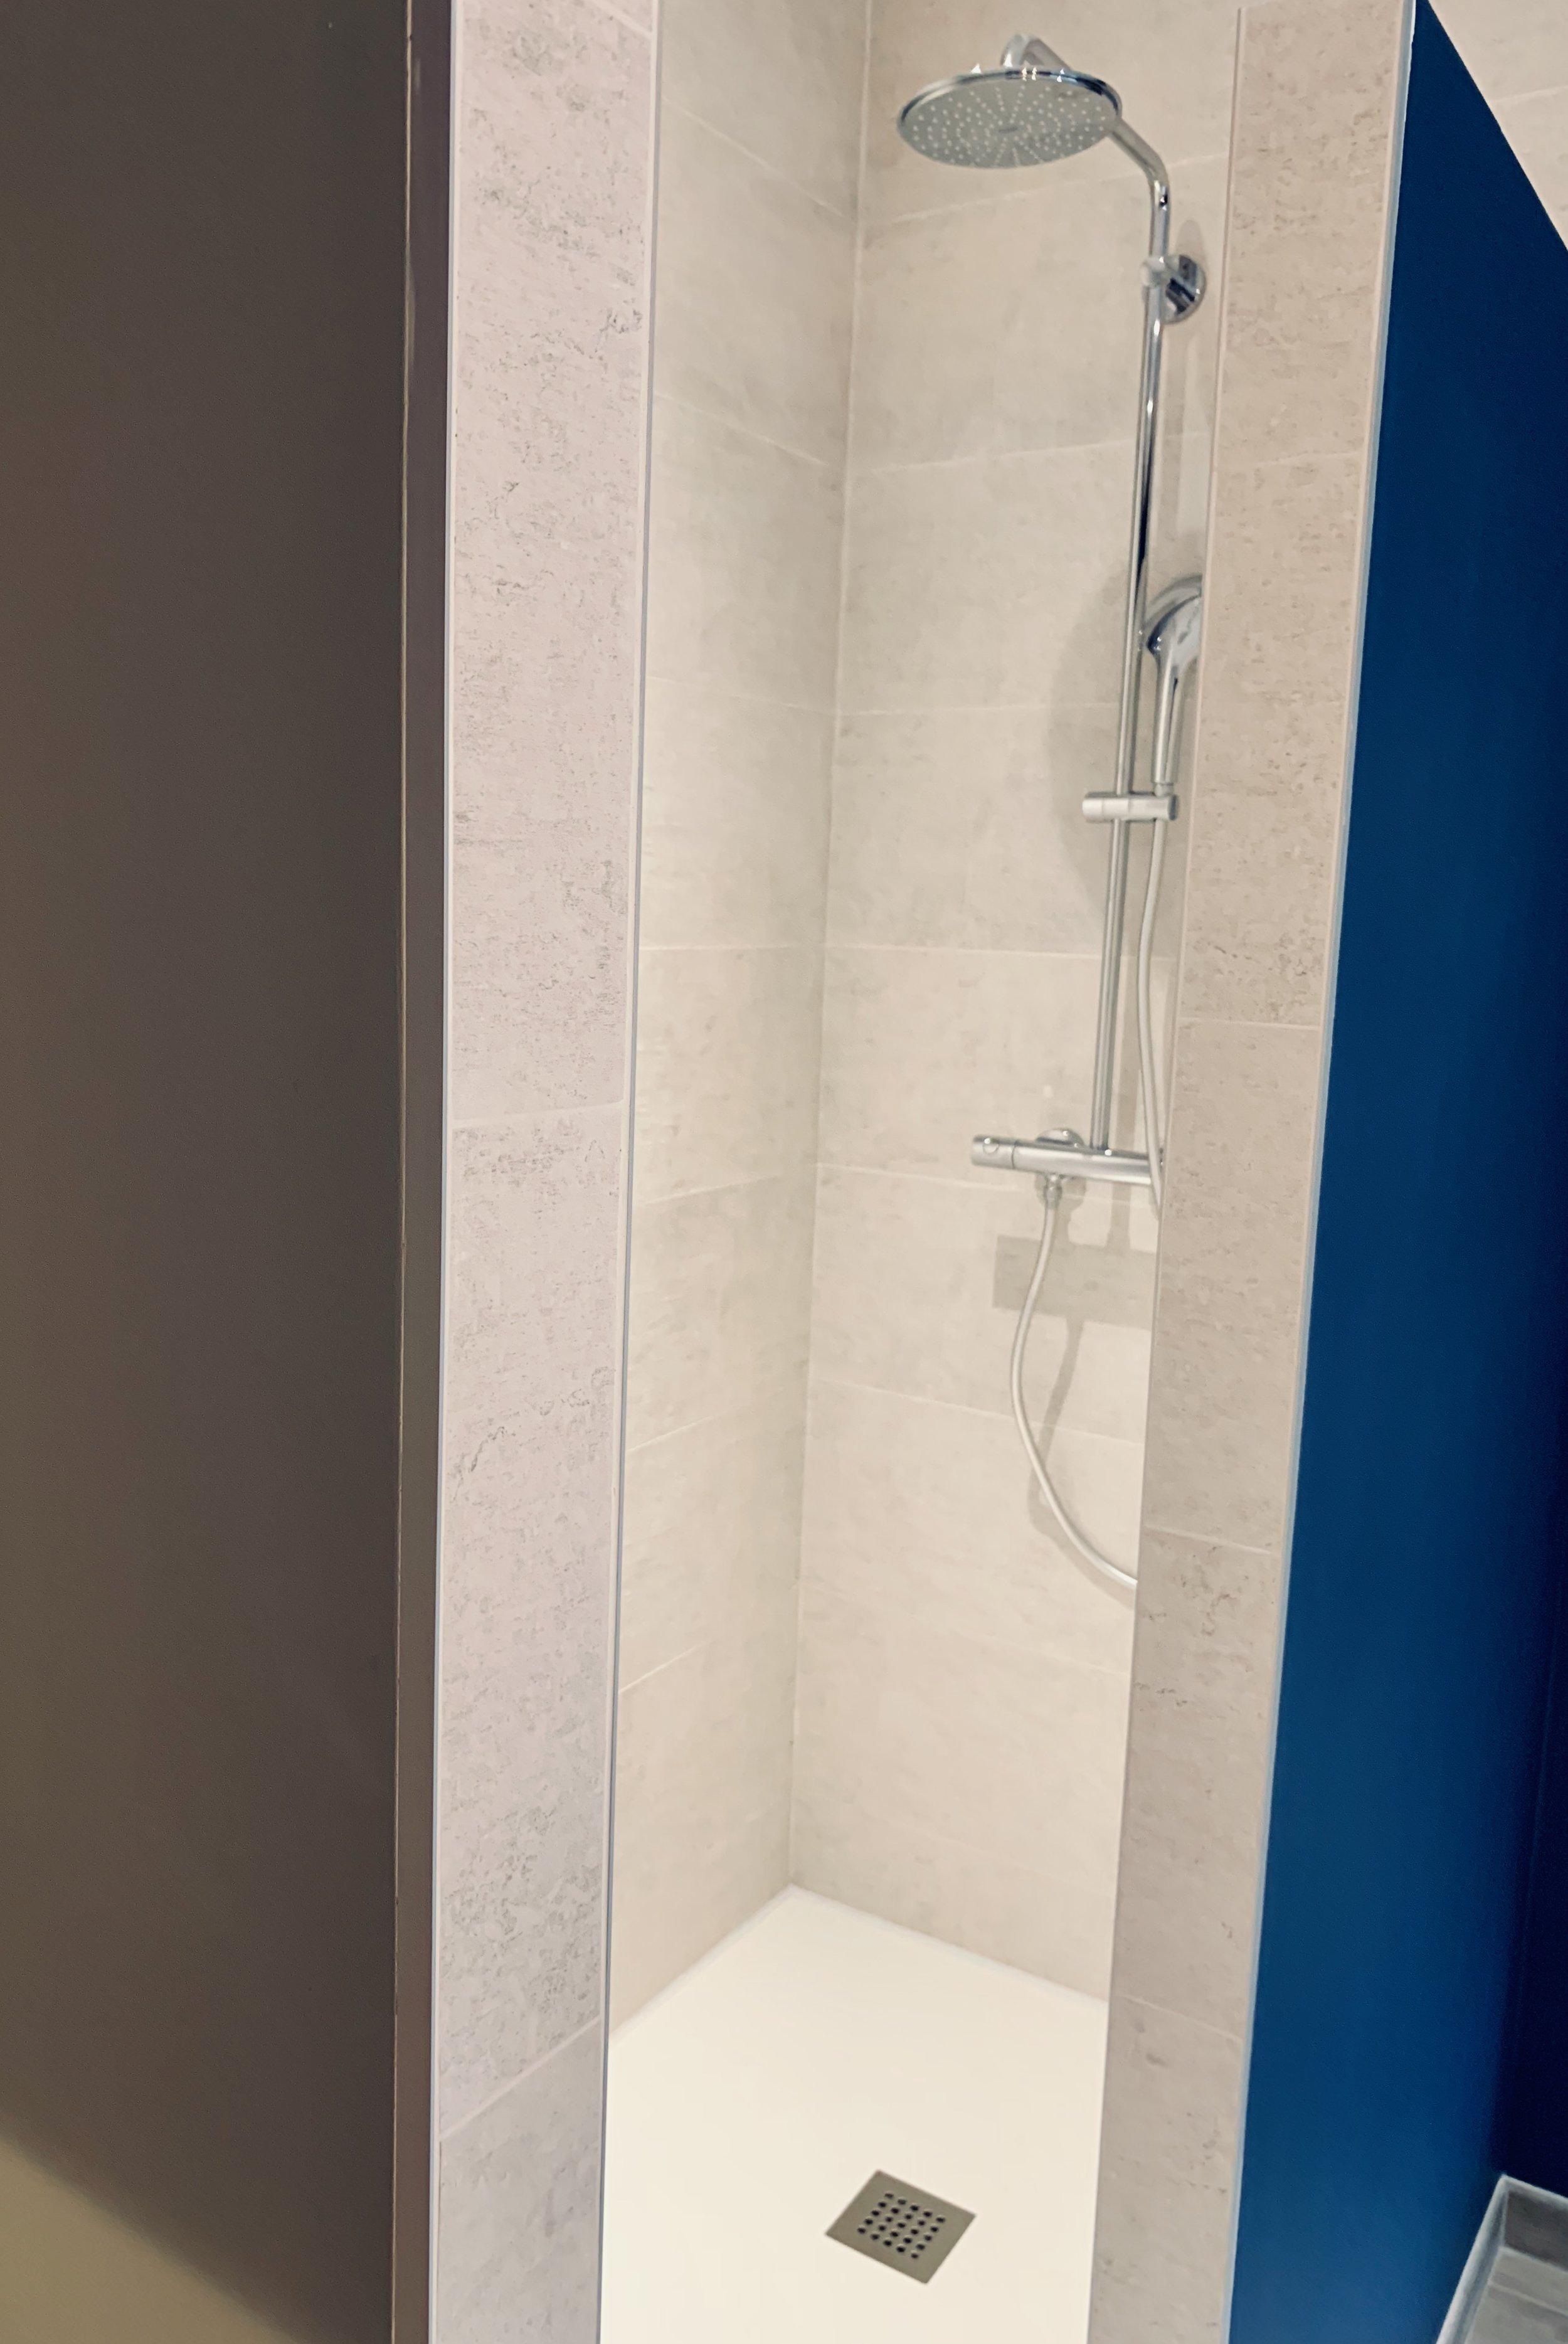 douche à l'italienne mur bleu